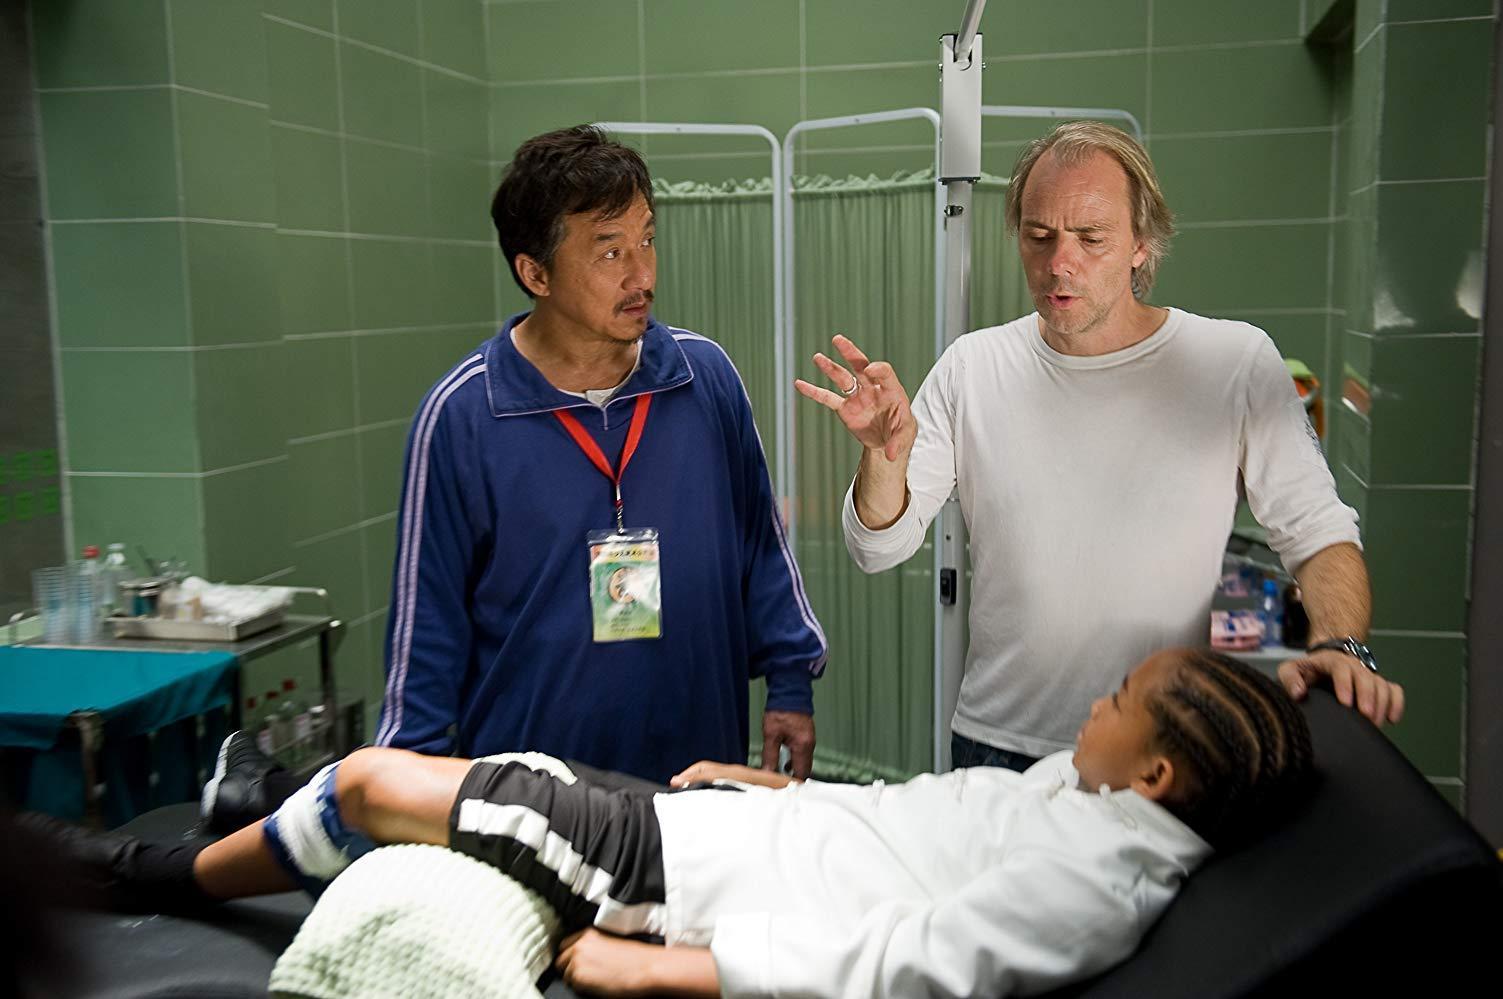 مشاهدة فيلم The Karate Kid 2010 HD مترجم كامل اون لاين